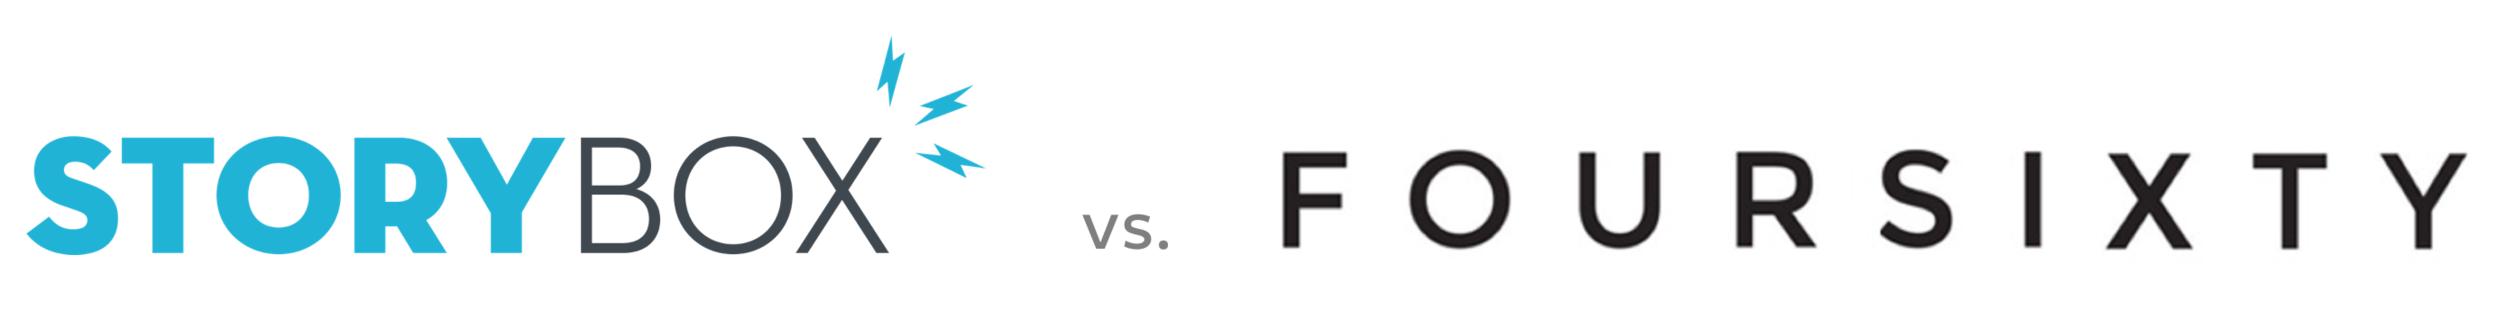 storybox vs foursixty